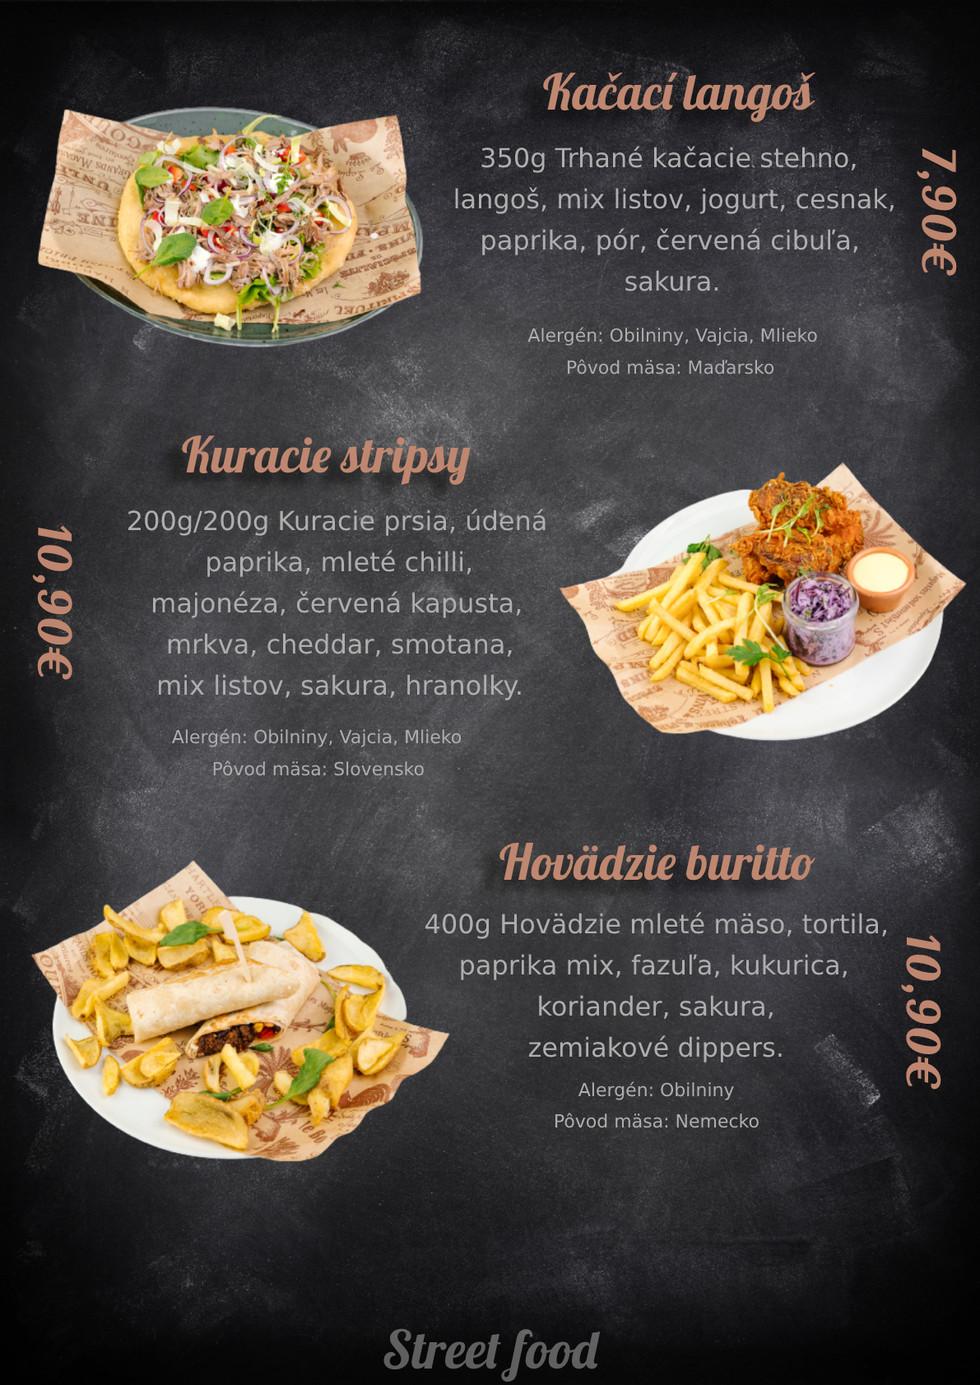 05_Street food-pdf (3).jpg